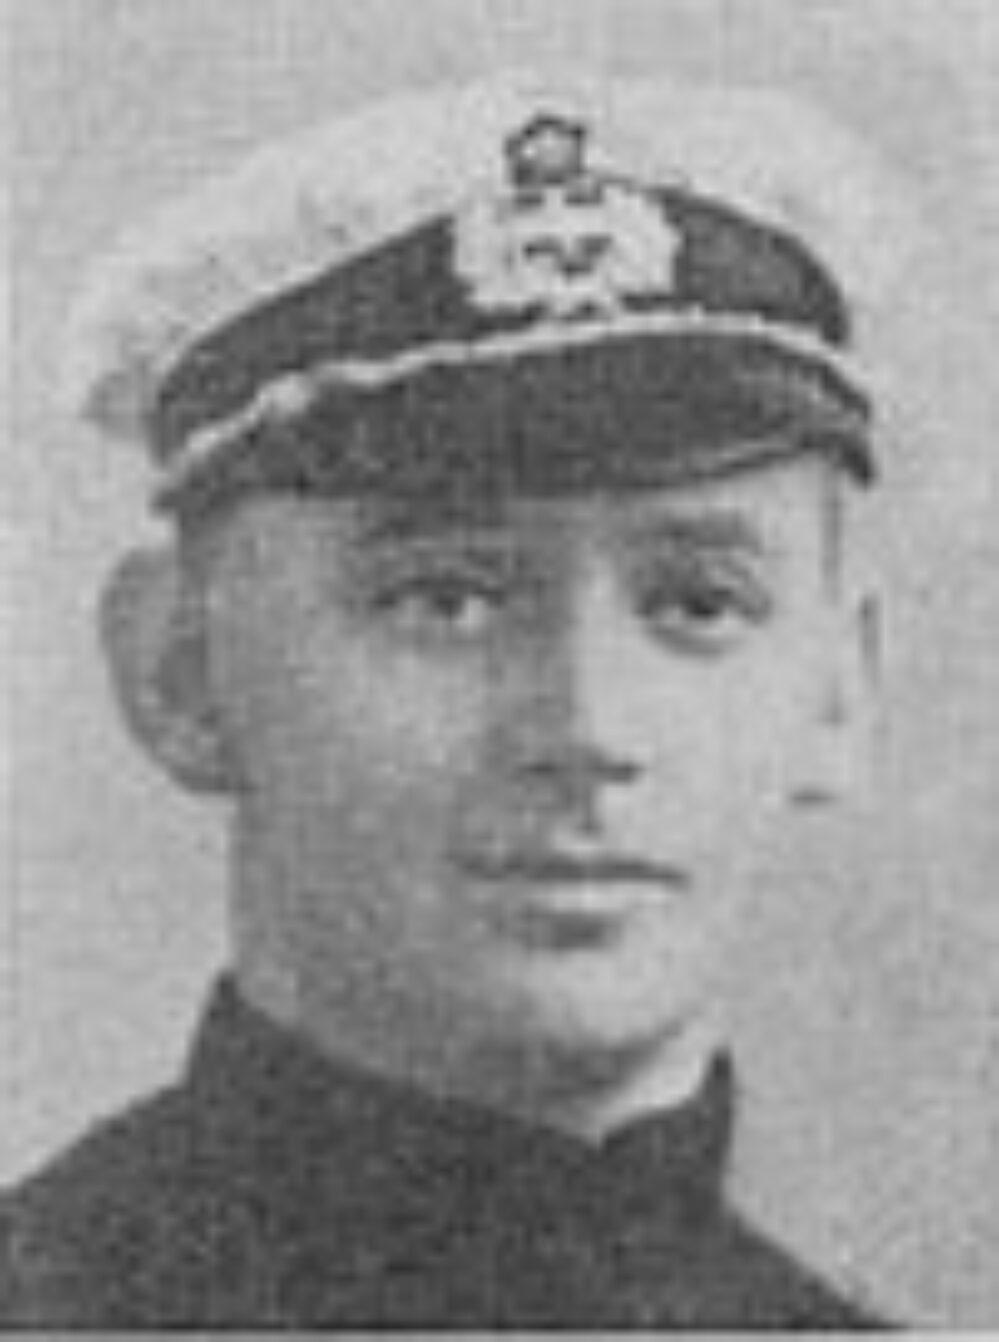 Karl Trygve Karlsen